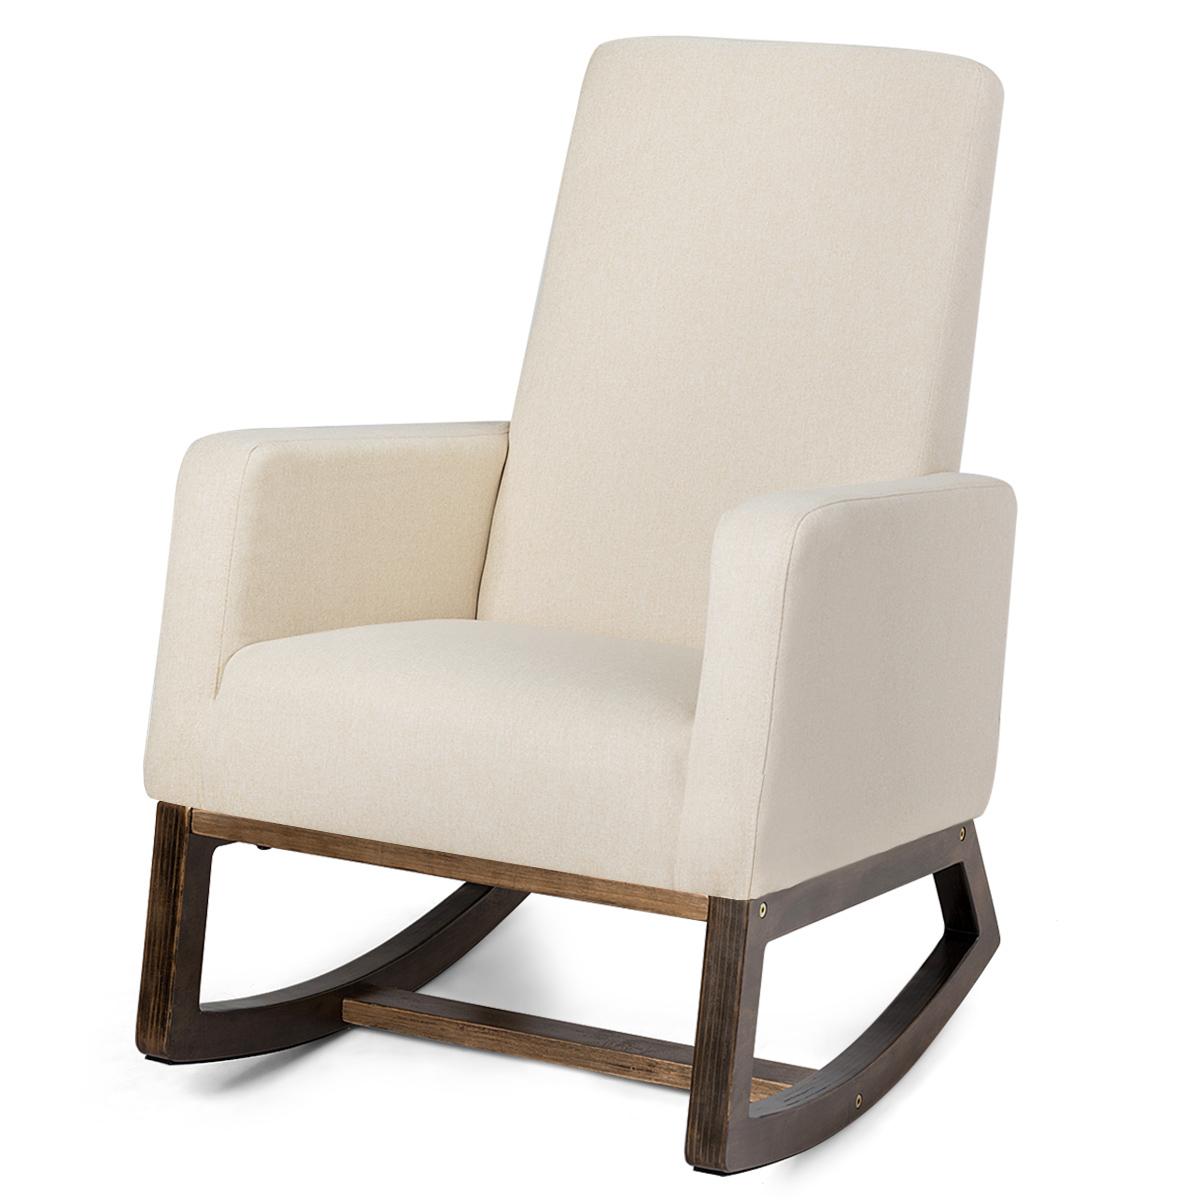 Details About Mid Century Rocking Chair Comfortable Rocker Modern High Back Armchair Beige